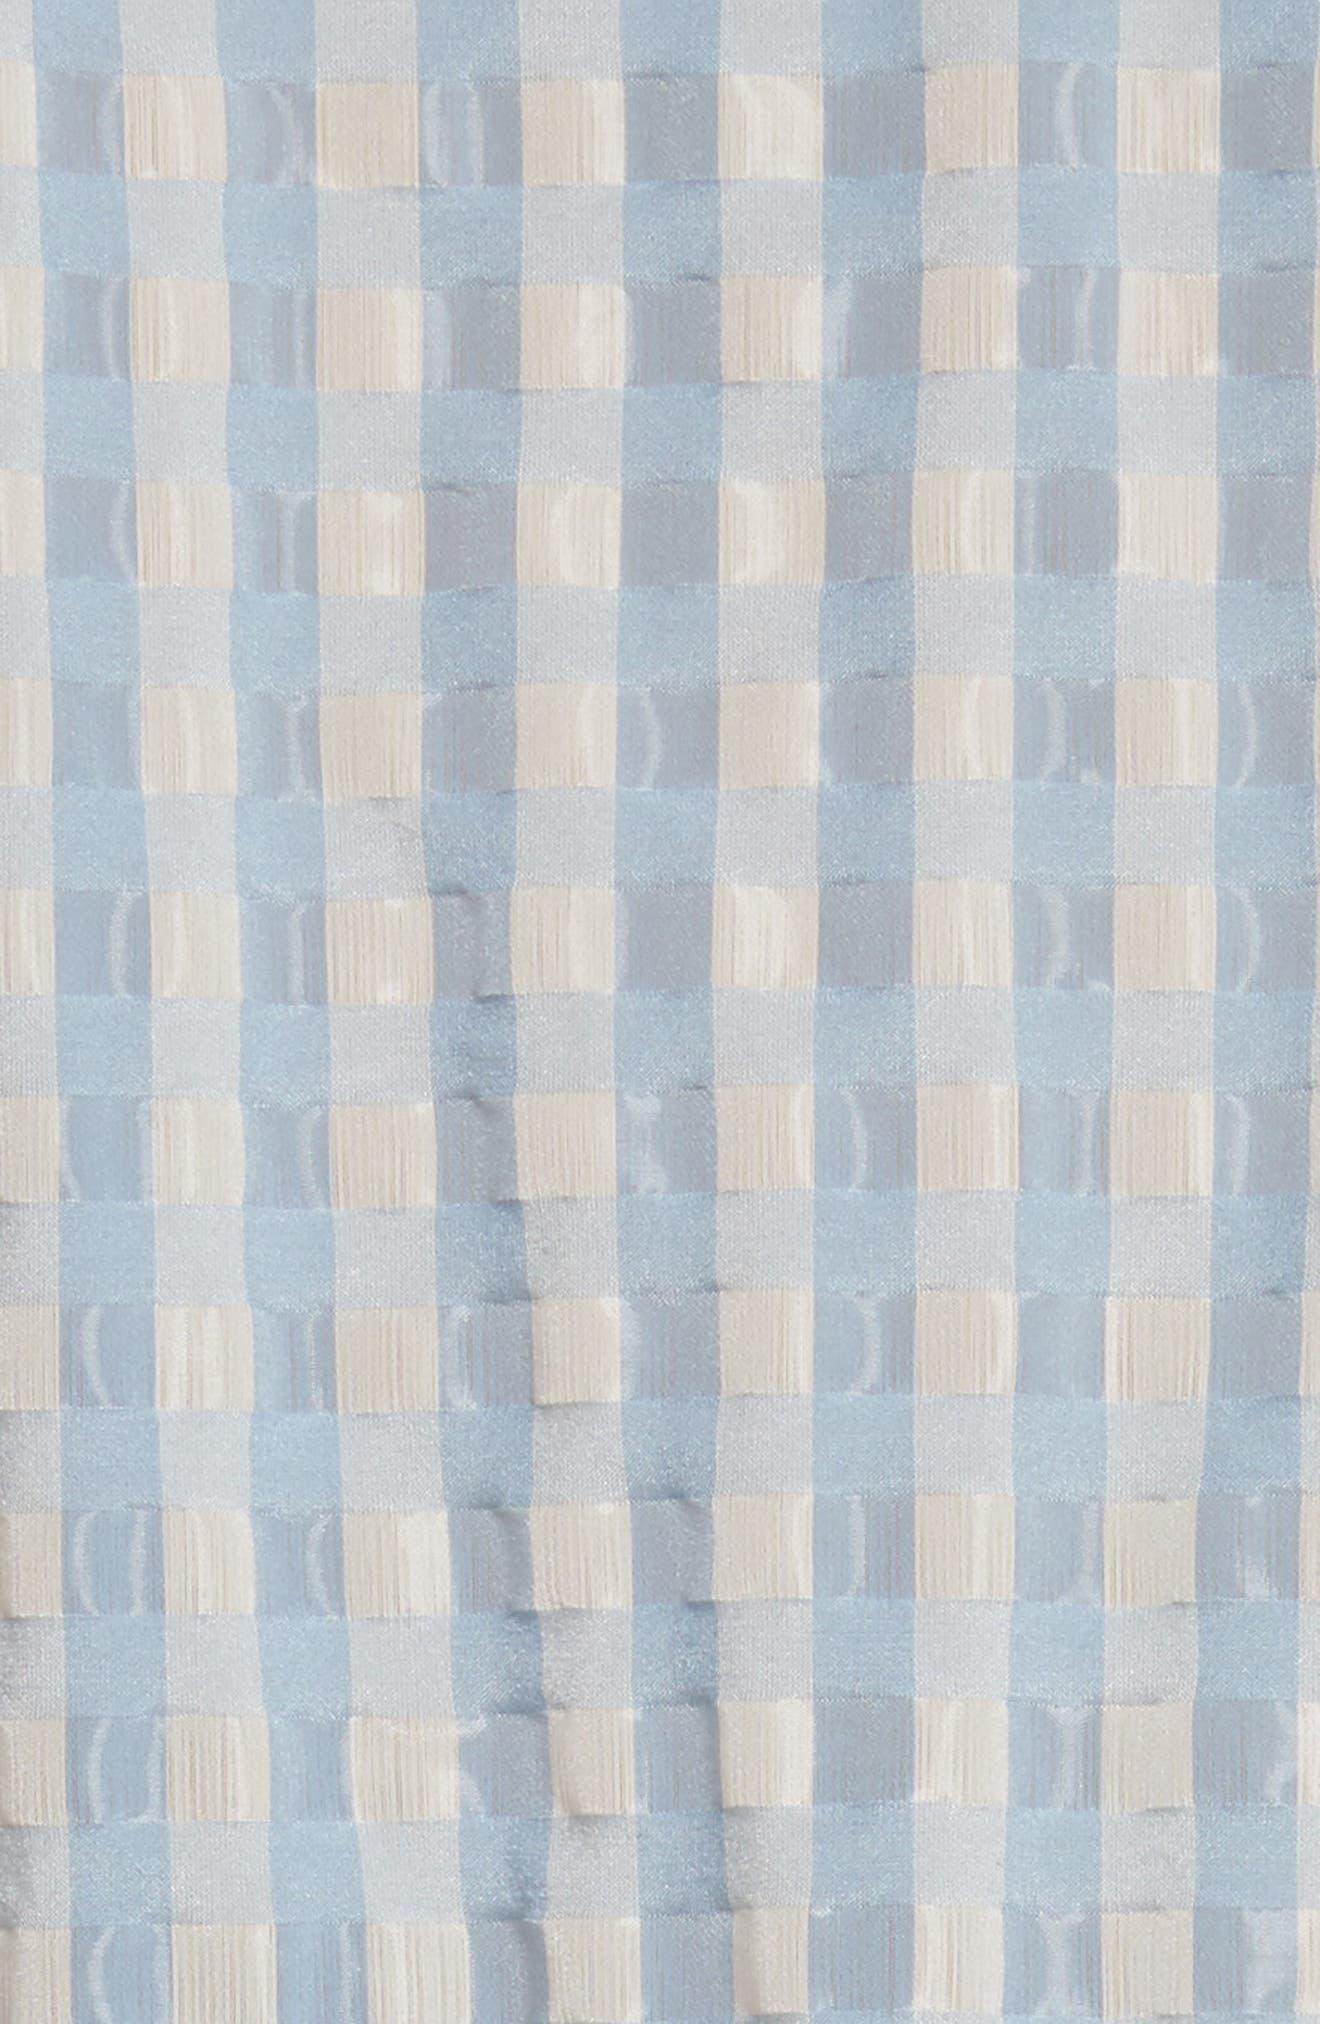 Hermione Gingham Seersucker Dress,                             Alternate thumbnail 6, color,                             Blue